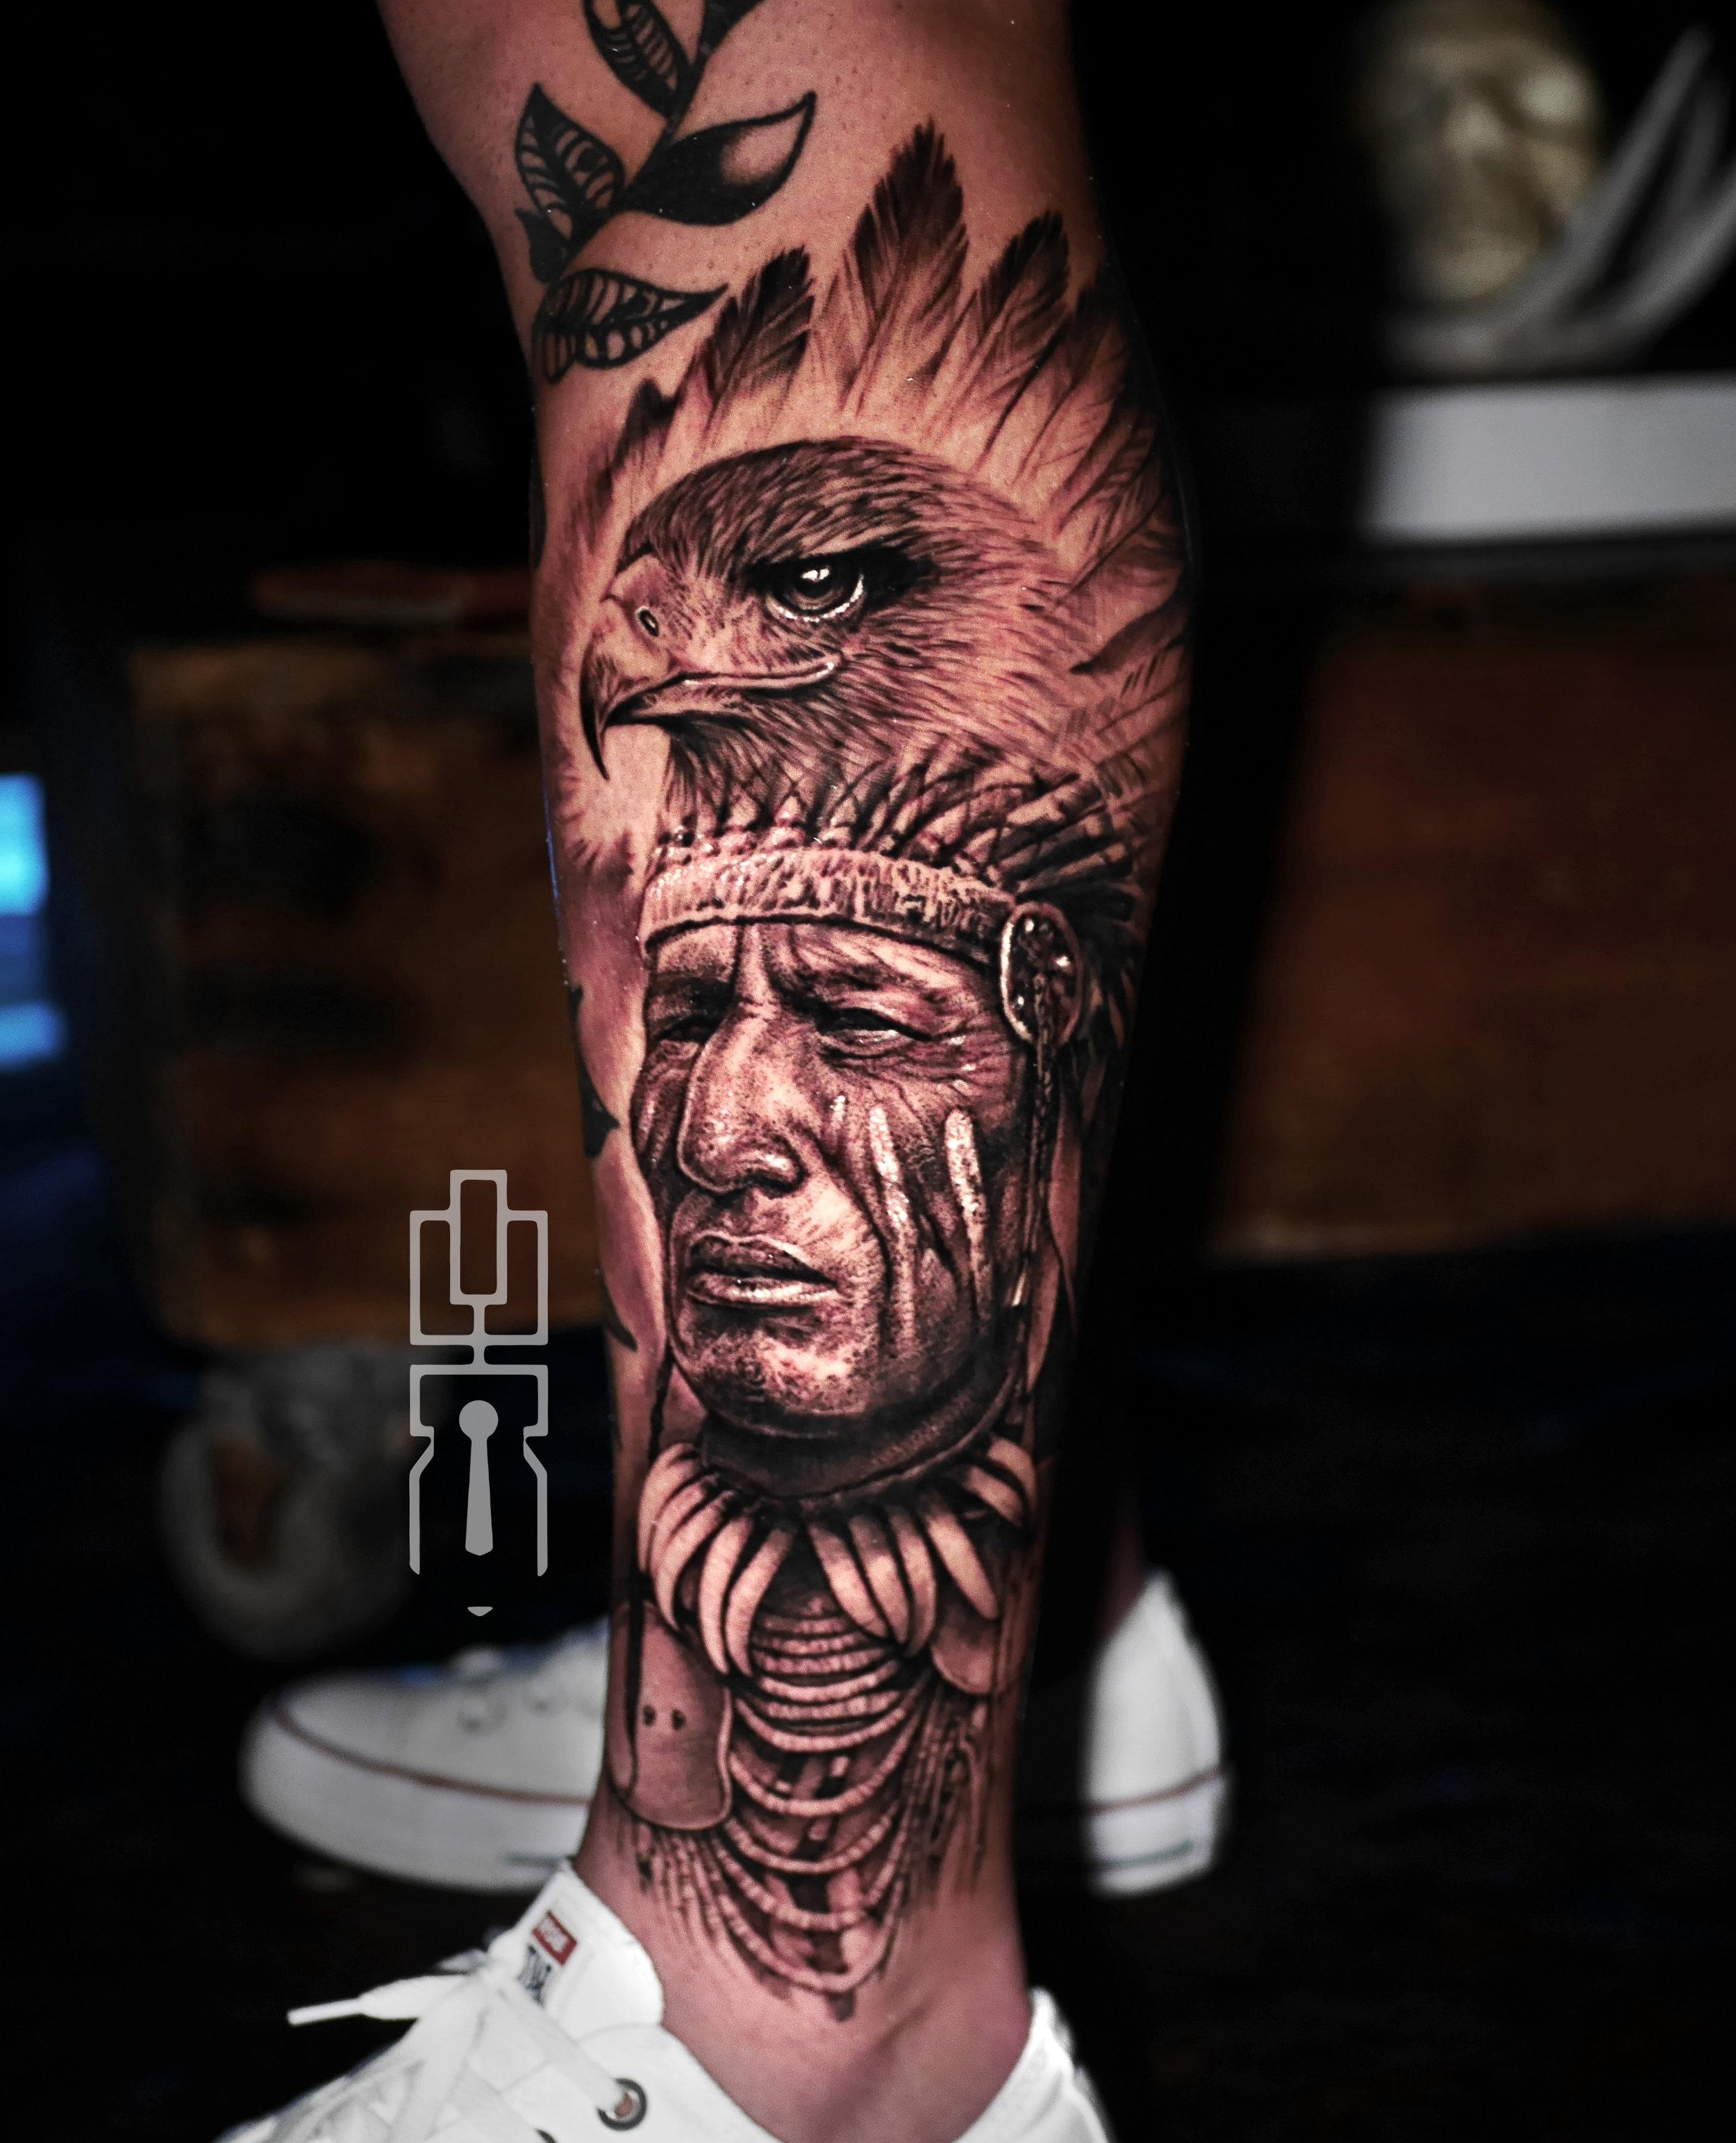 native american chief tattoo.jpg